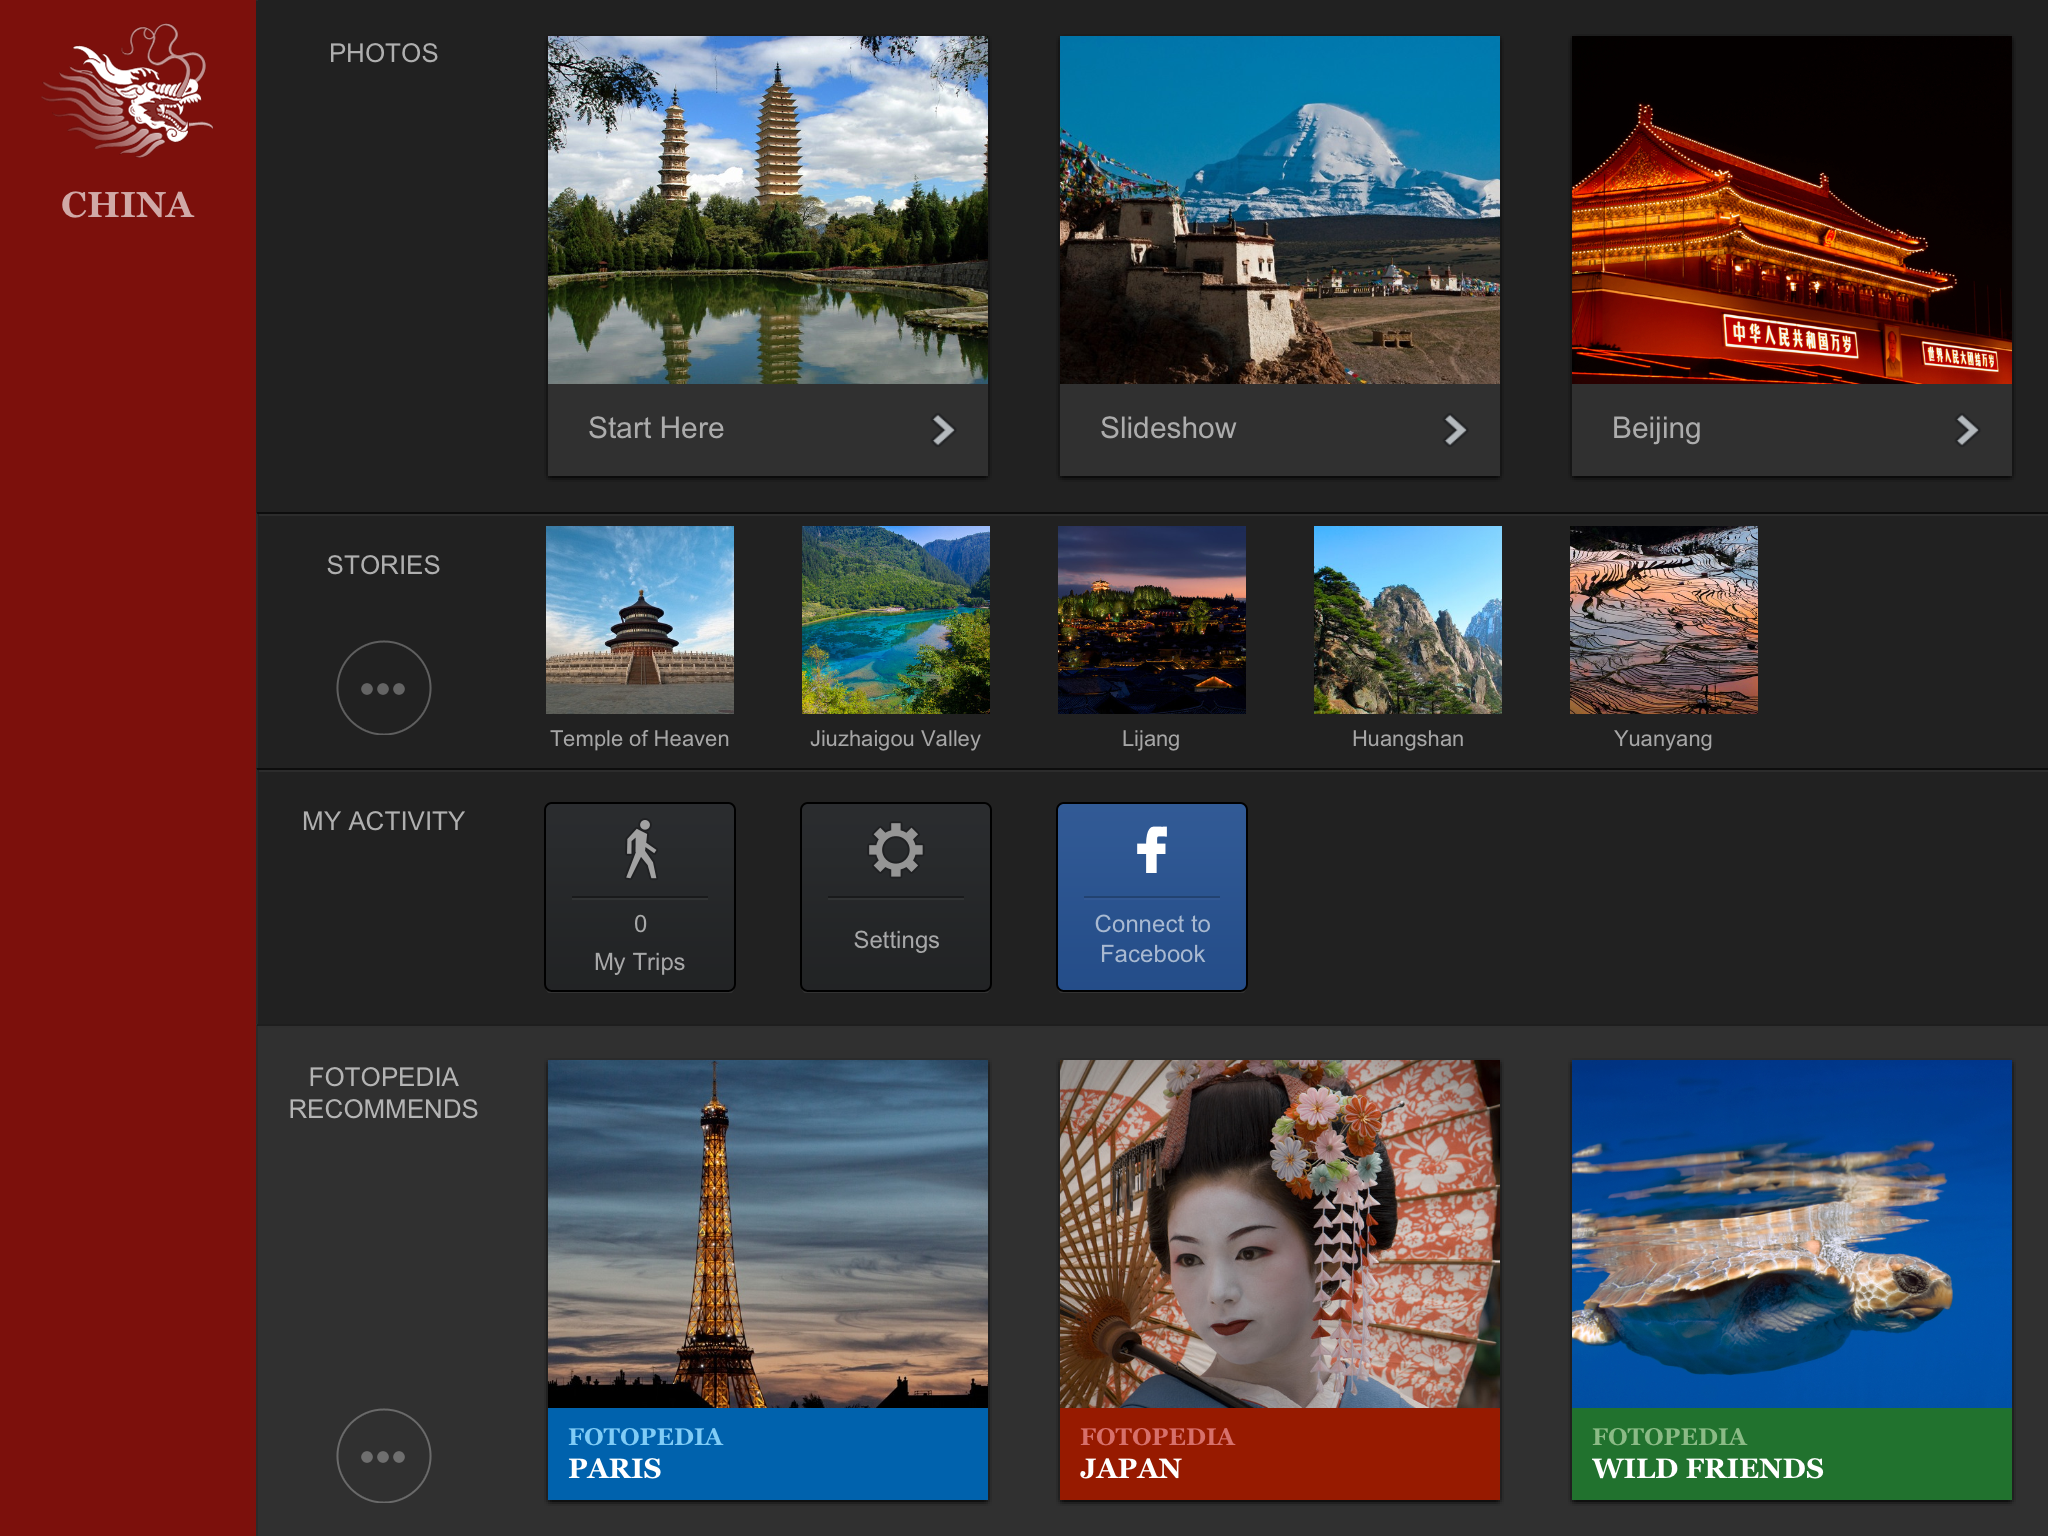 Fotopedia Launches China iPad ...